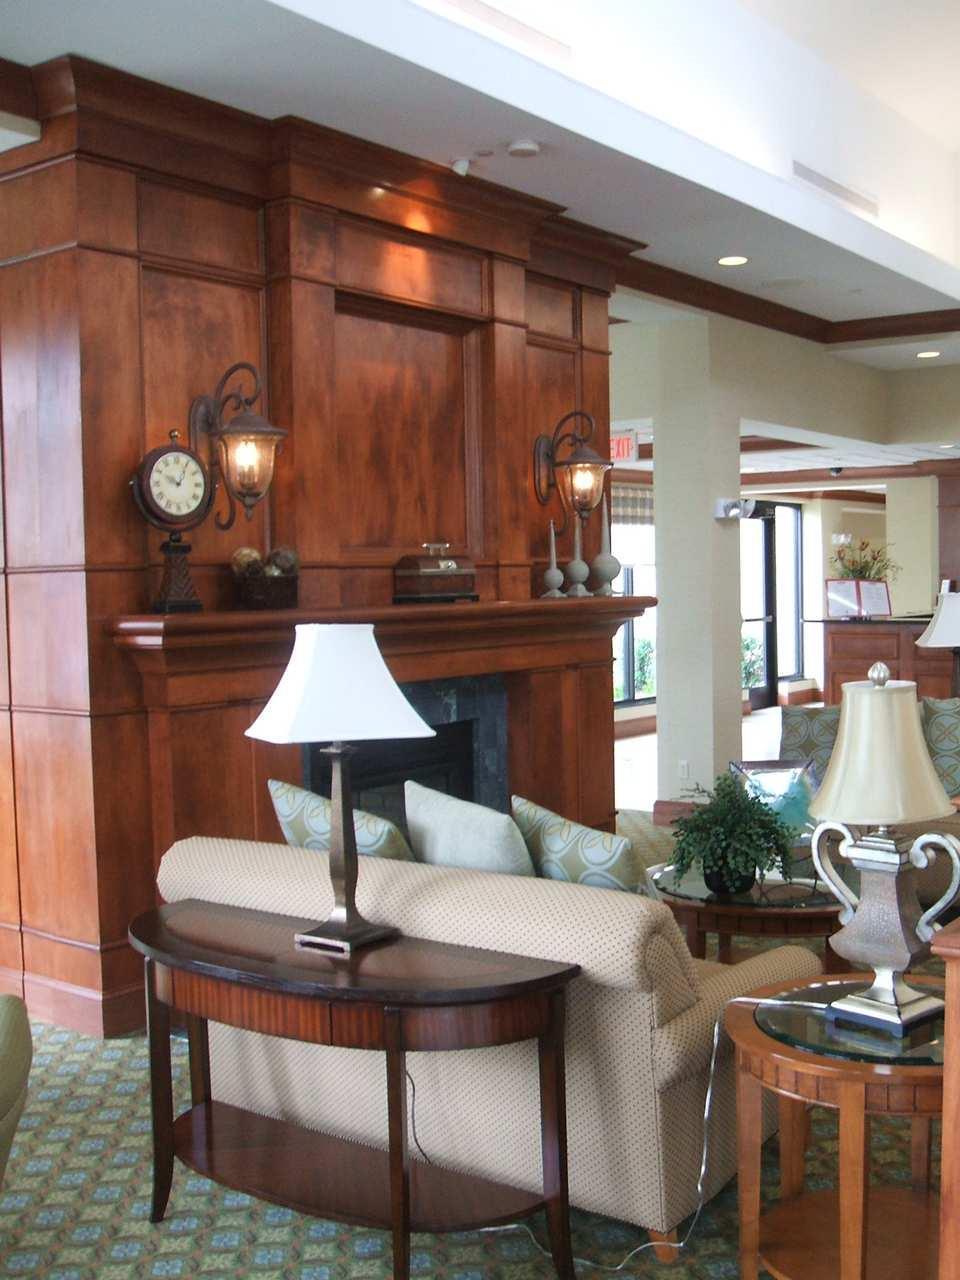 Hilton Garden Inn Memphis/Southaven, MS image 1